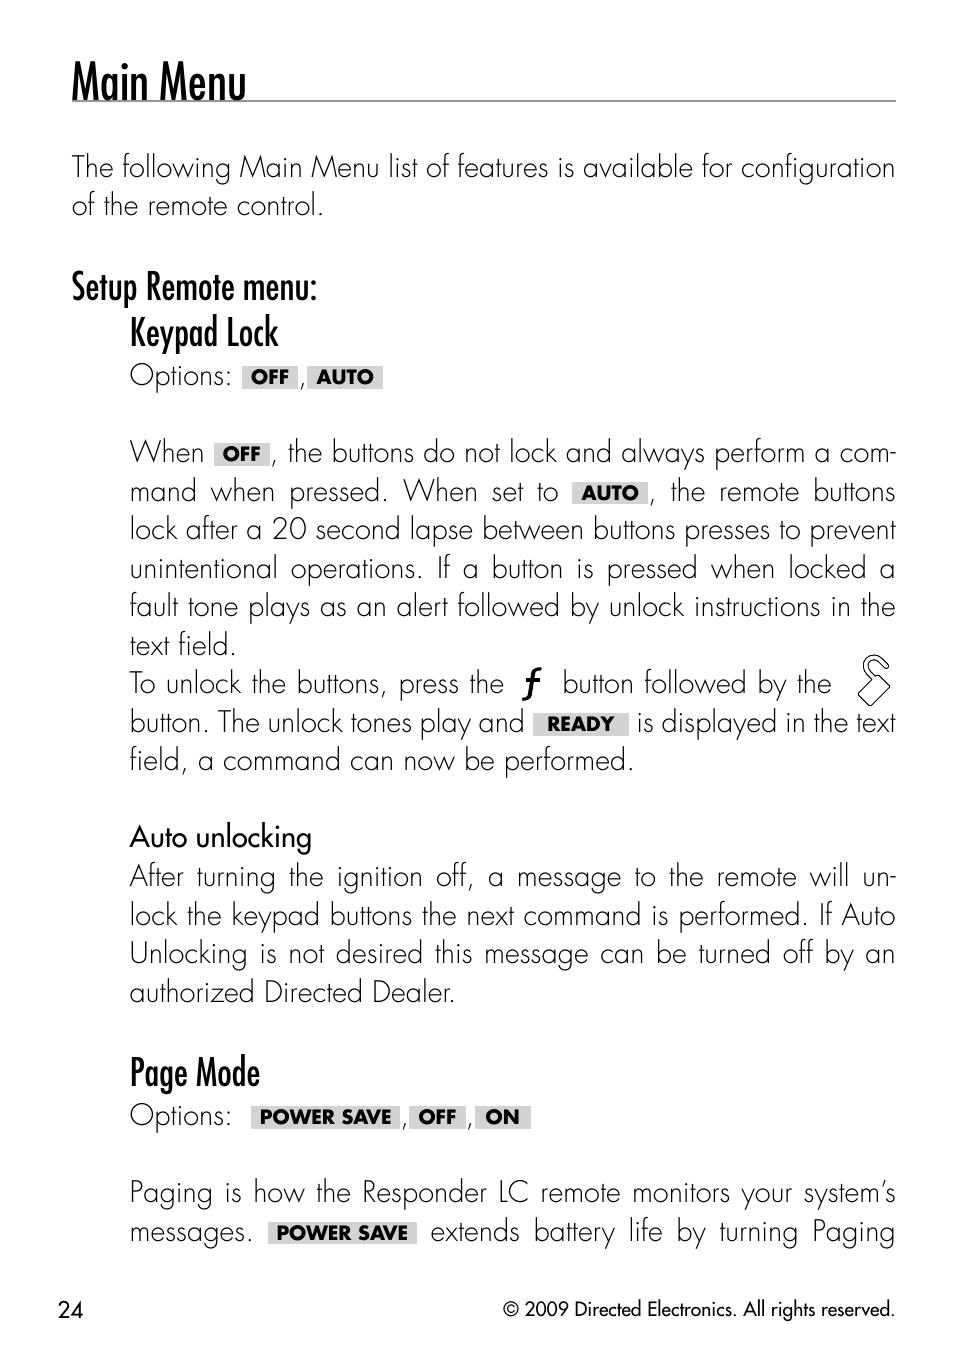 5901 Viper Manual Wiring Diy Detailed Installation Main Menu Setup Remote Keypad Lock Page Mode Rh Manualsdir Com 501 Problems